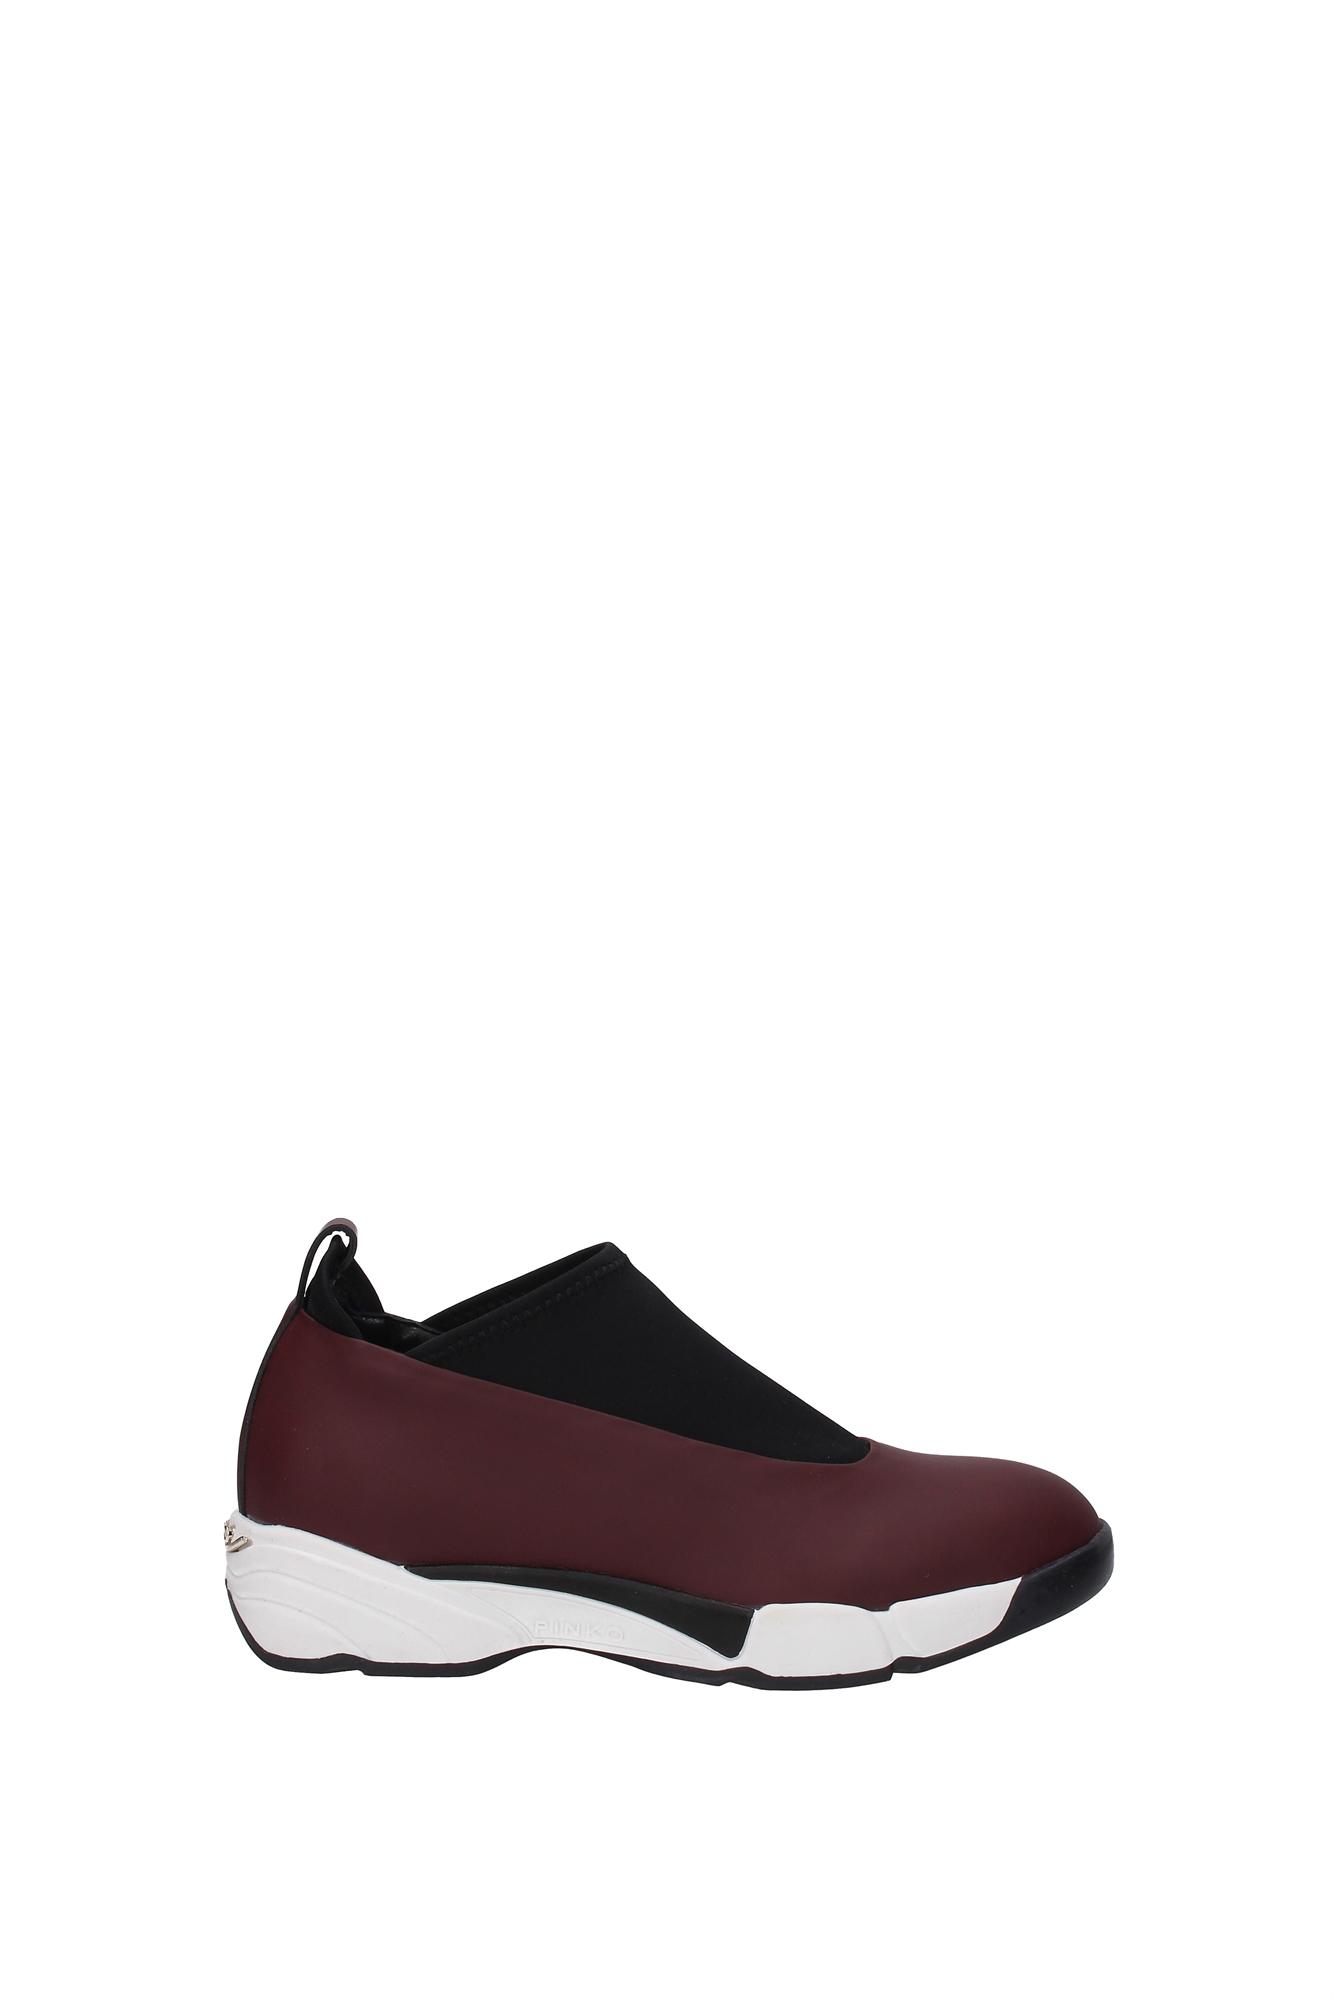 Sneakers Pinko Damen - Stoff (1H208UY2P6R35) (1H208UY2P6R35) Stoff 71cd30